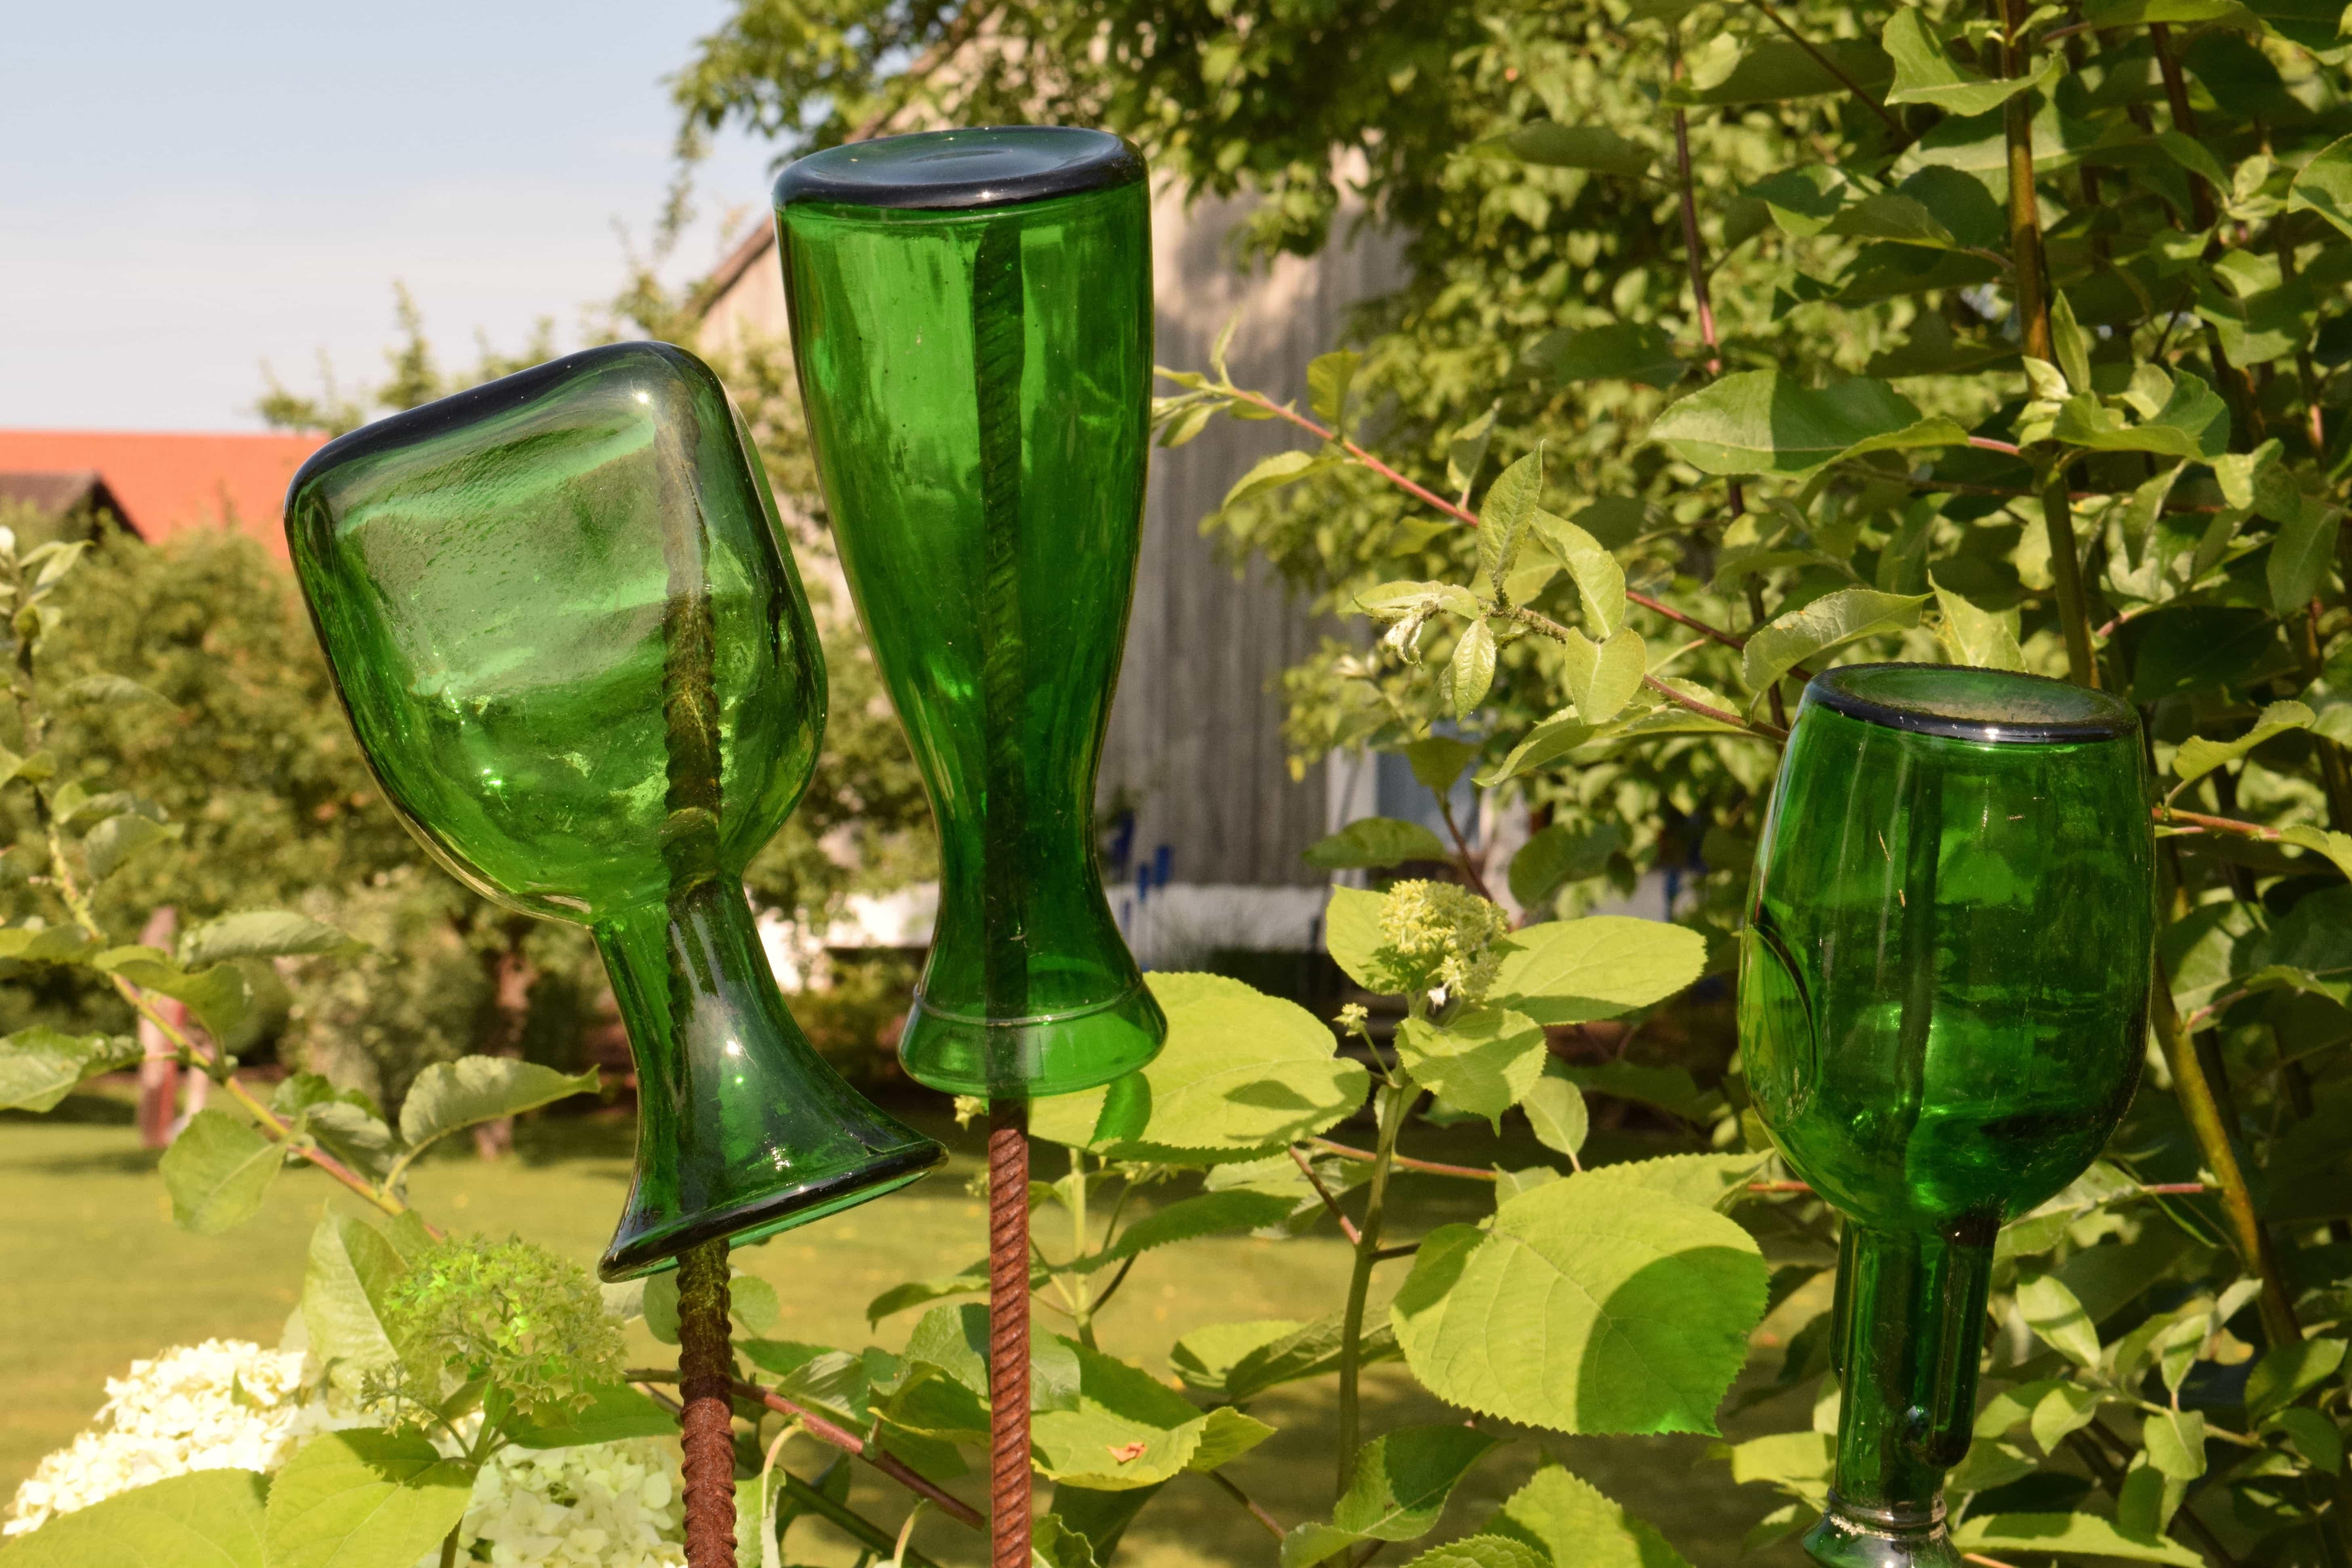 Free picture glass bottle leaf garden outdoor backyard for Jardin glass jars